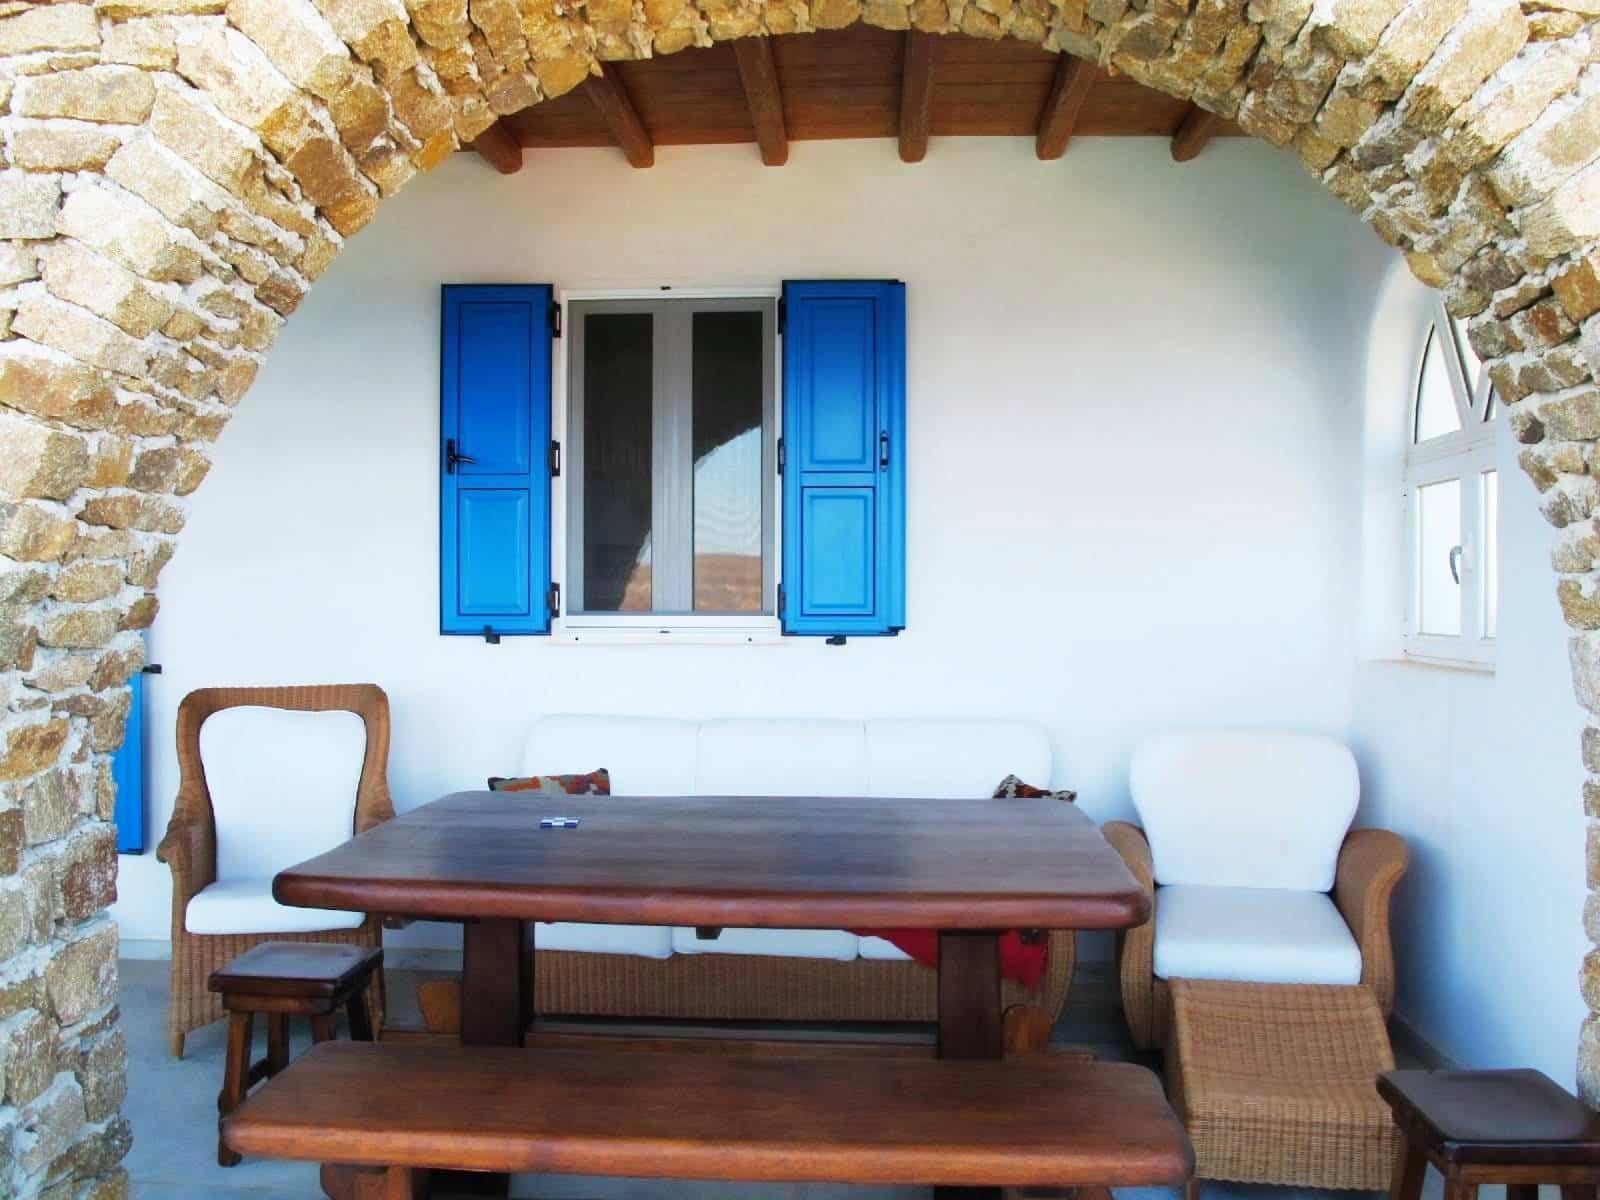 luxurious villa Mykonos - πολυτελής βίλα Μύκονος - mykonos services - οικοδομικές εργασίες 15